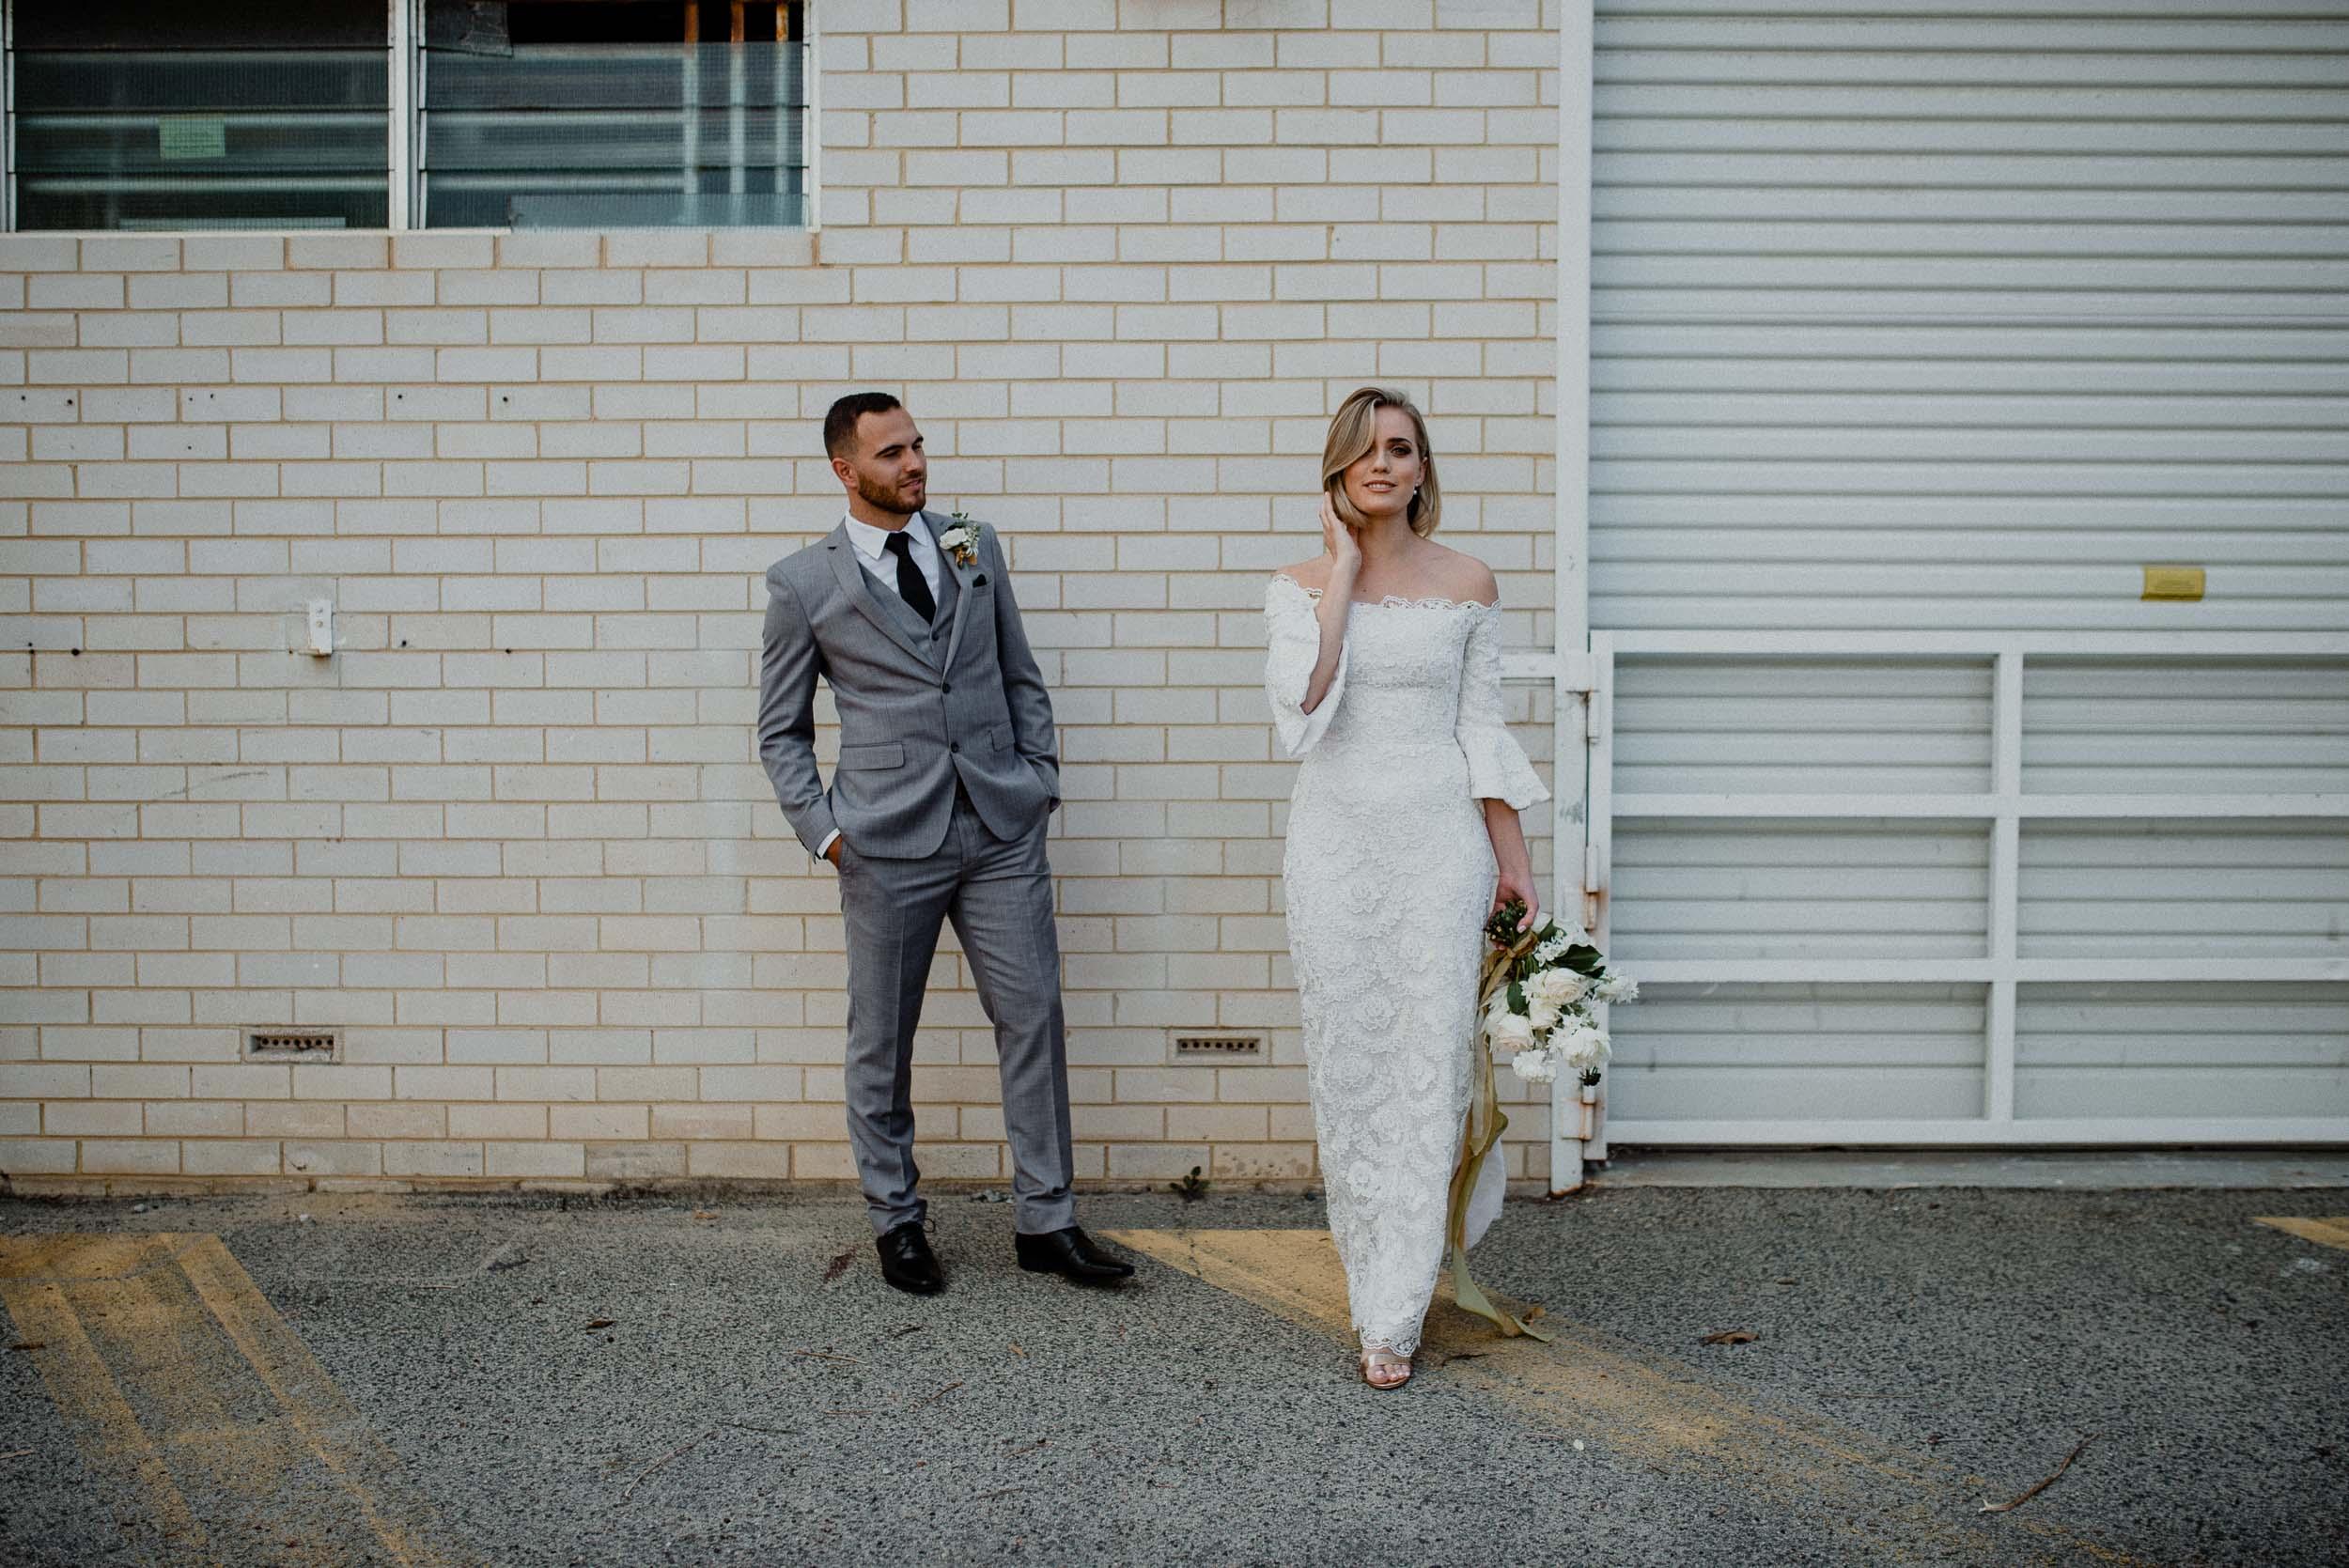 perth-botanical-warehouse-wedding-36.JPG